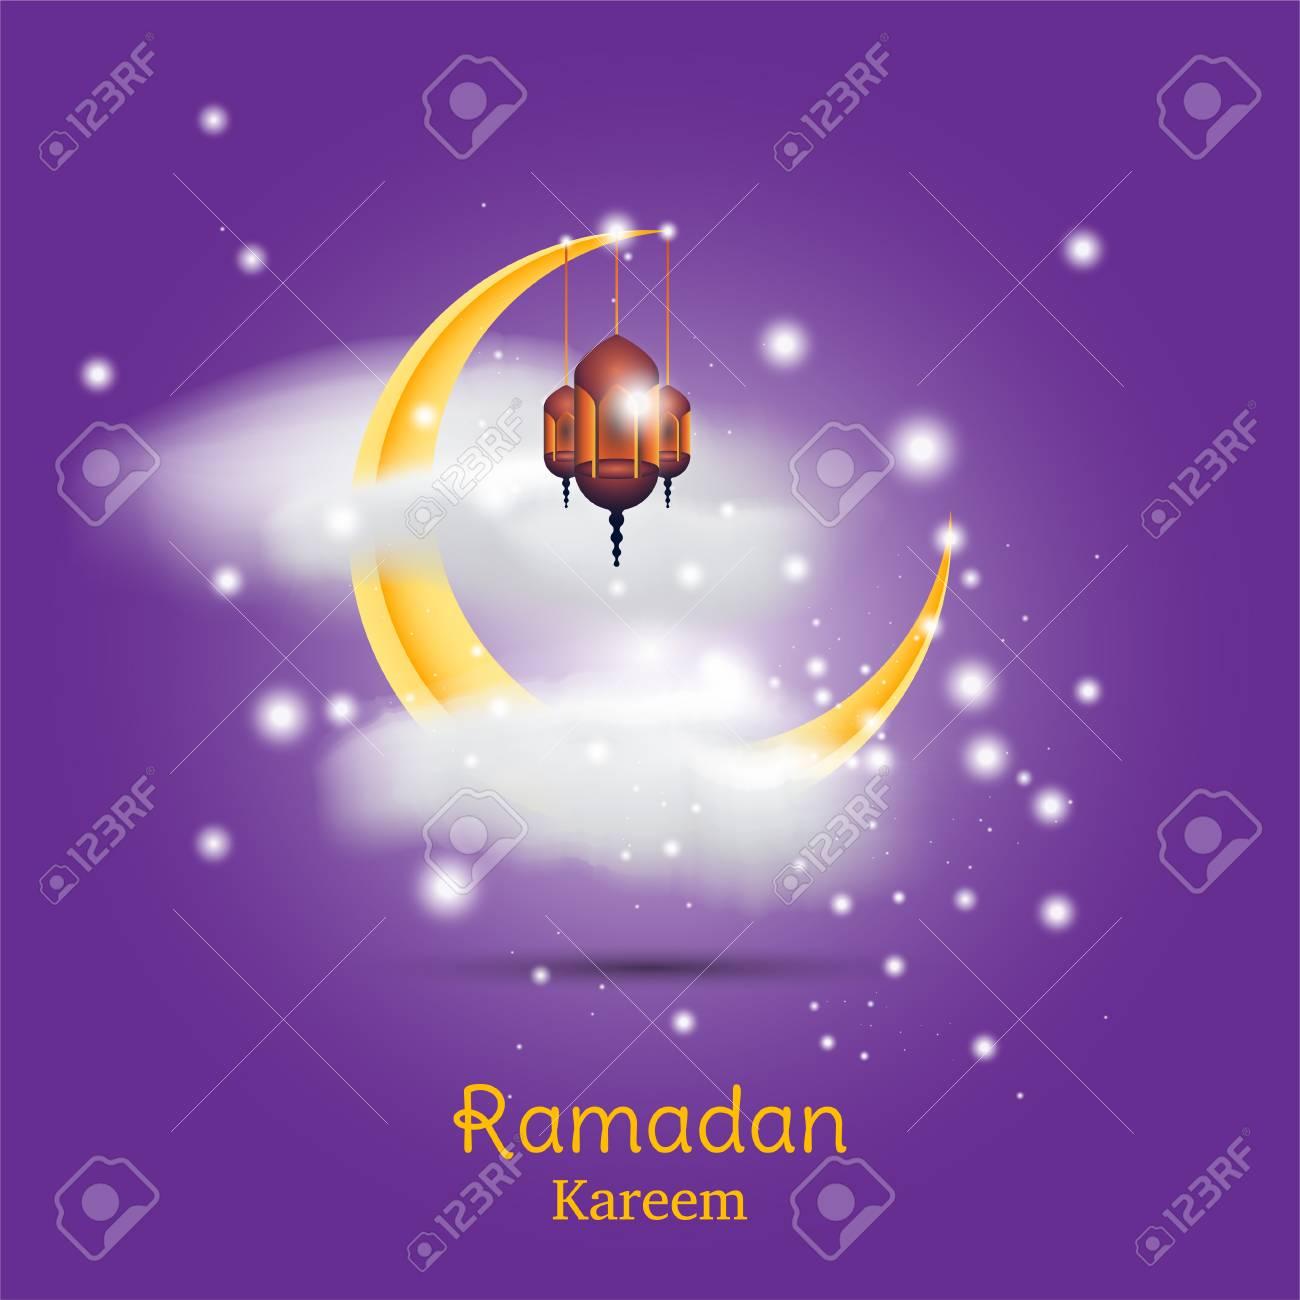 ramadan kareem greeting card template with crescent moon lamp